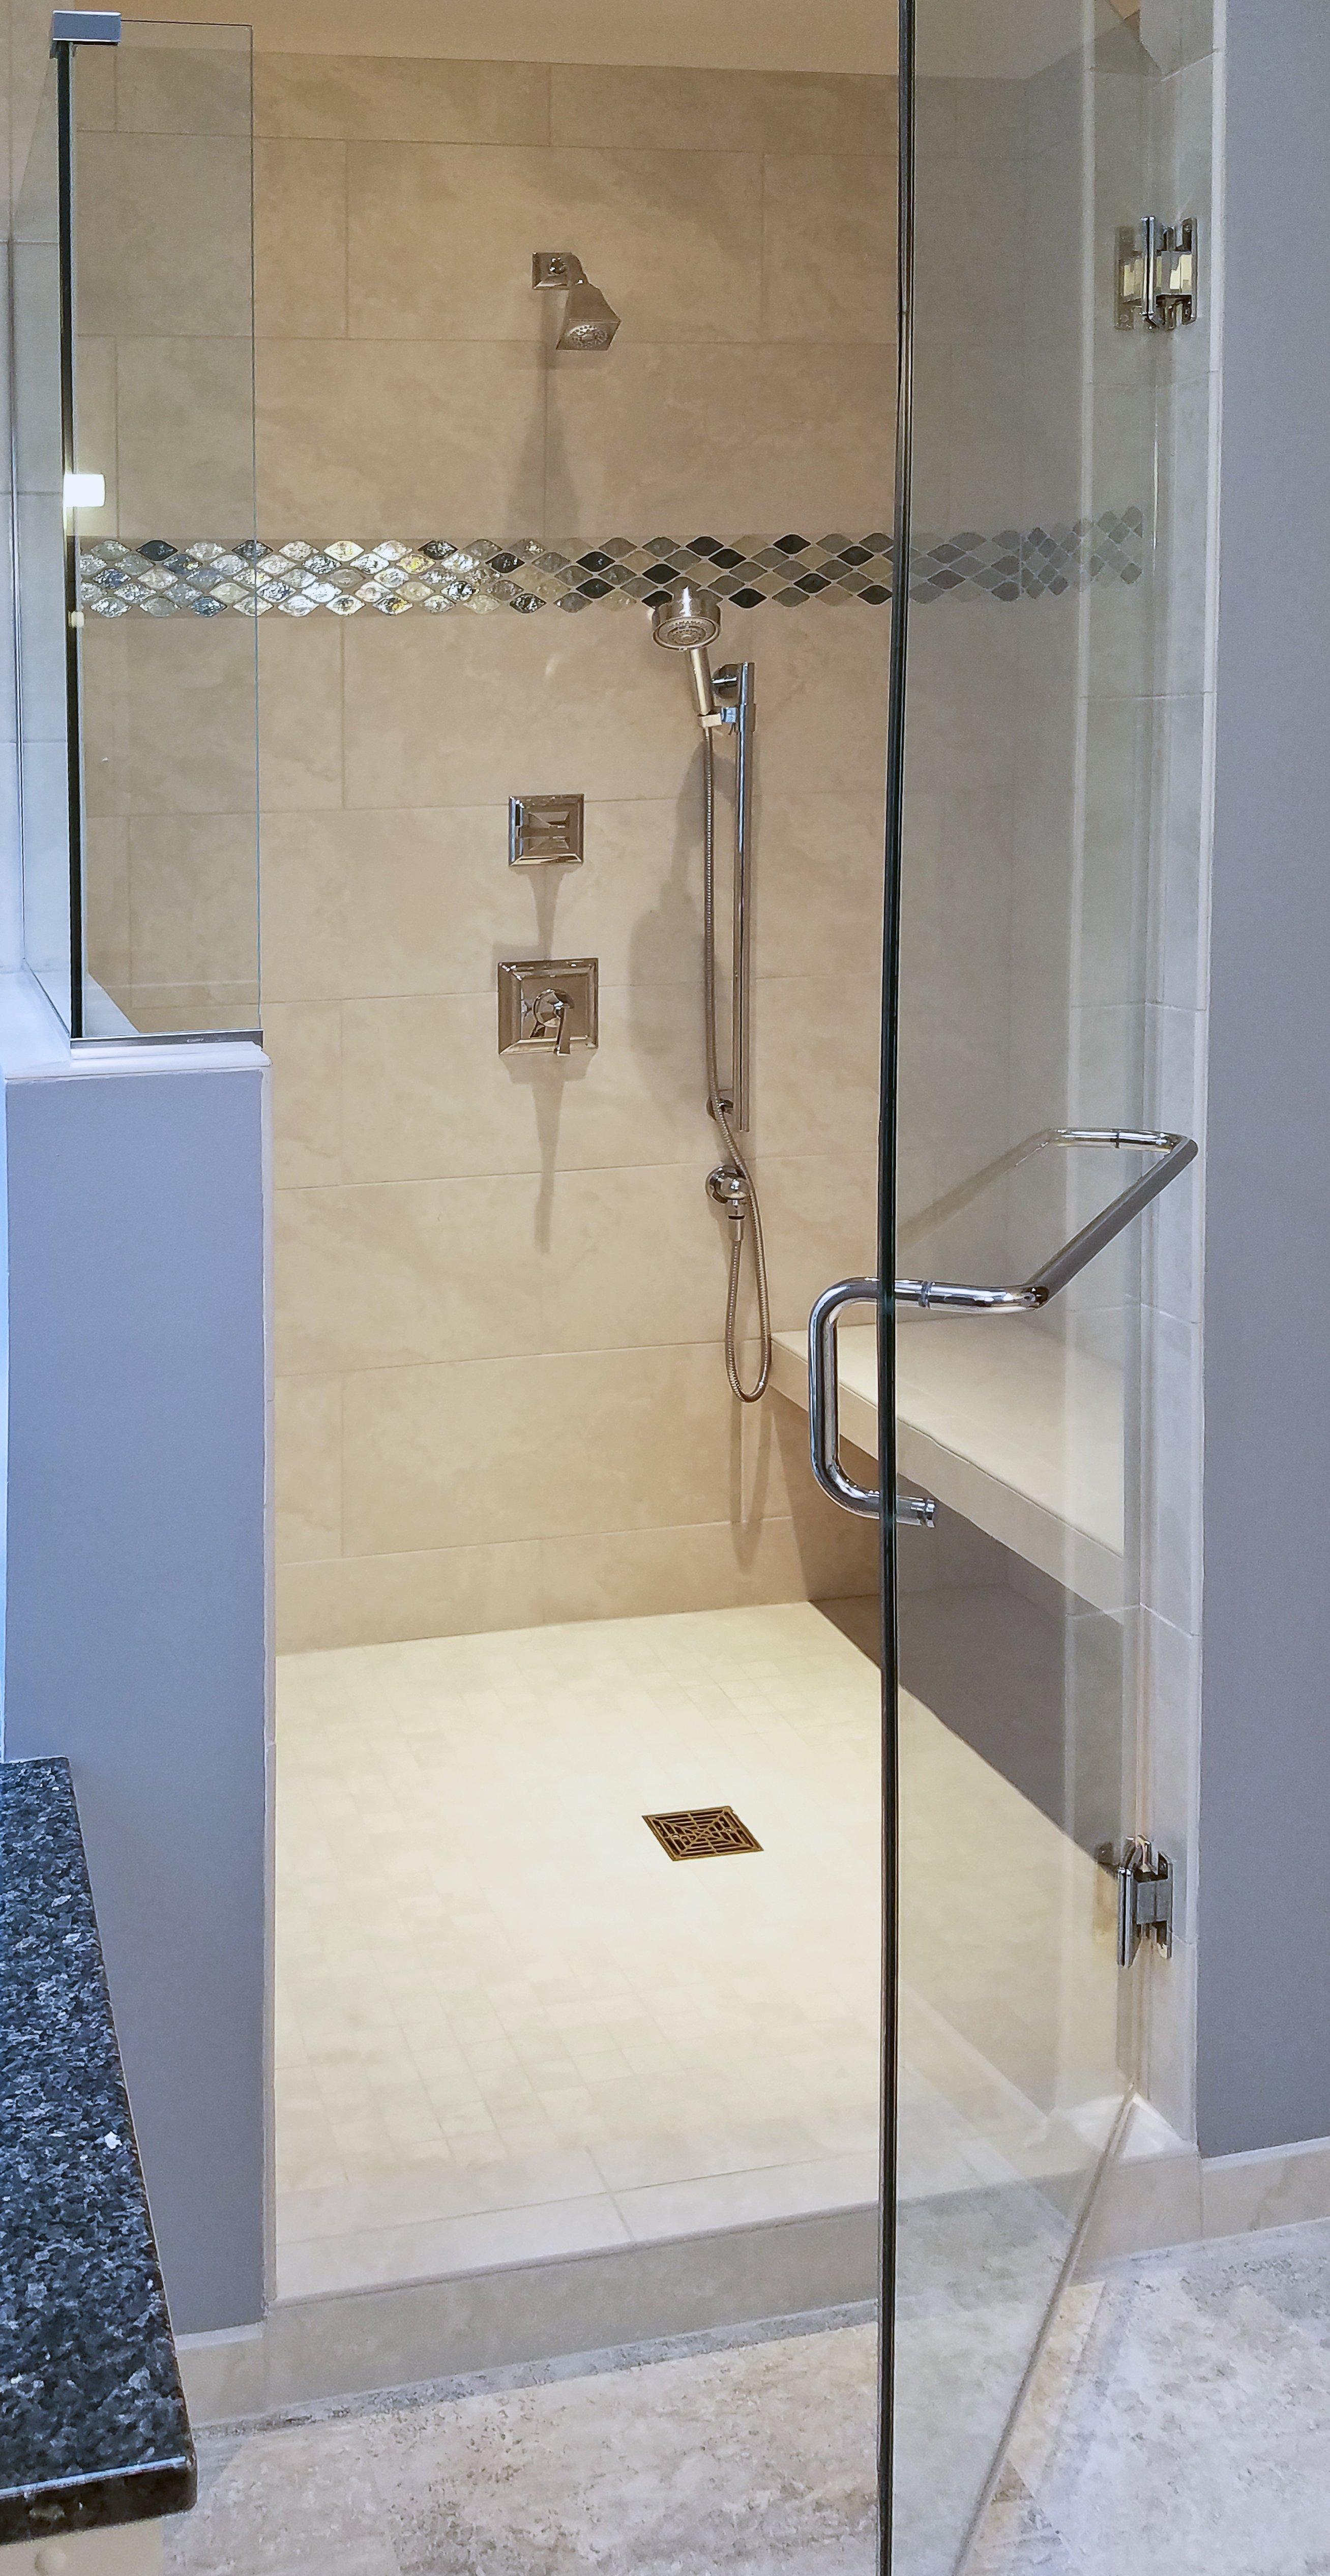 Bathroom Design, custom walk-in shower, blue glass accent tile, glass shower door